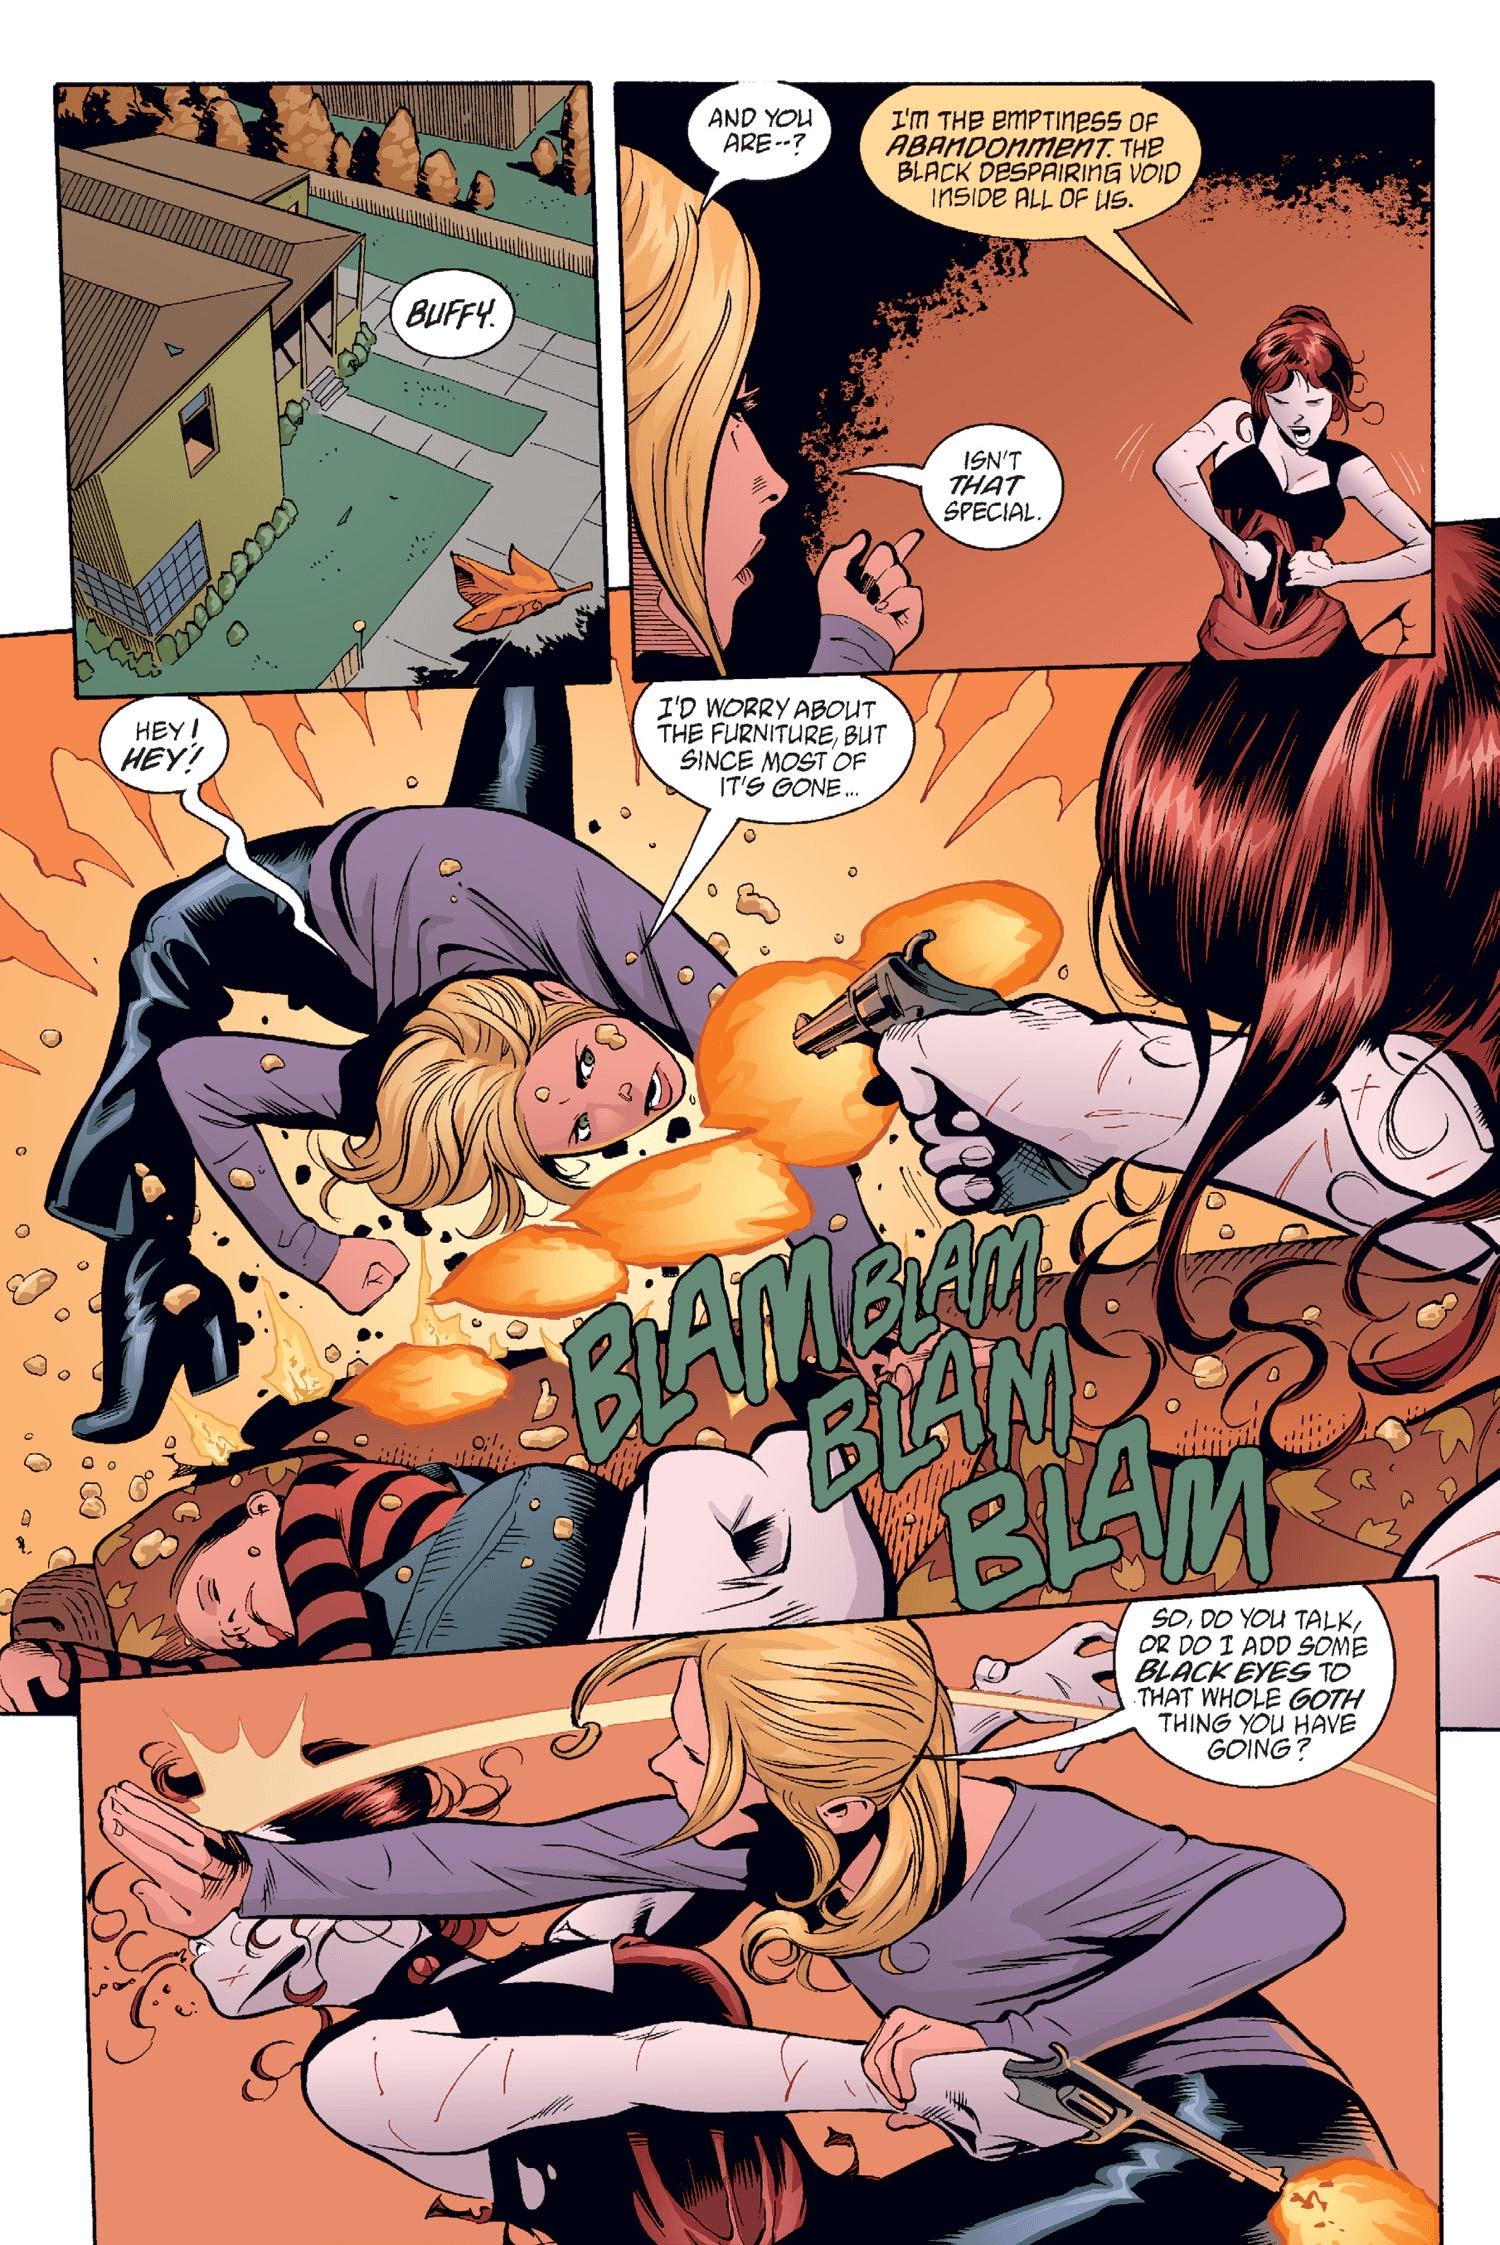 Read online Buffy the Vampire Slayer: Omnibus comic -  Issue # TPB 2 - 71